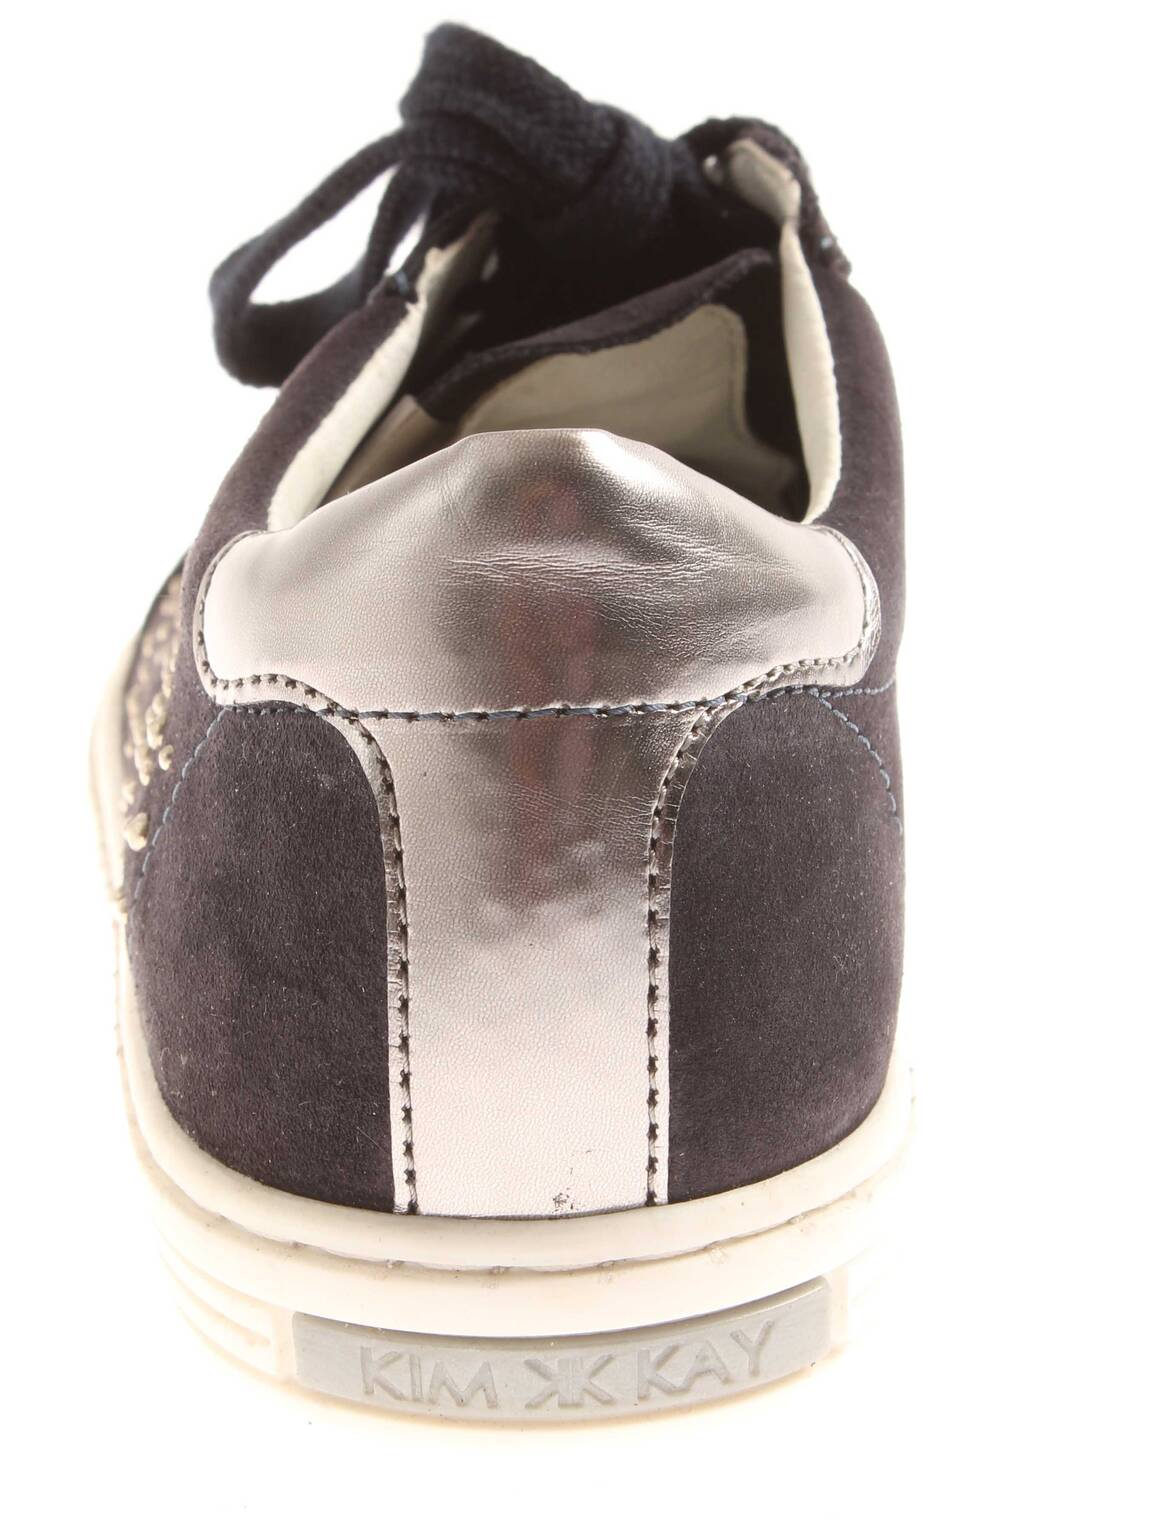 Kimkay Damenschuhe Sneaker Schuhe Leder Schnürer Kinder Schnürer Leder 8205 29cbcc